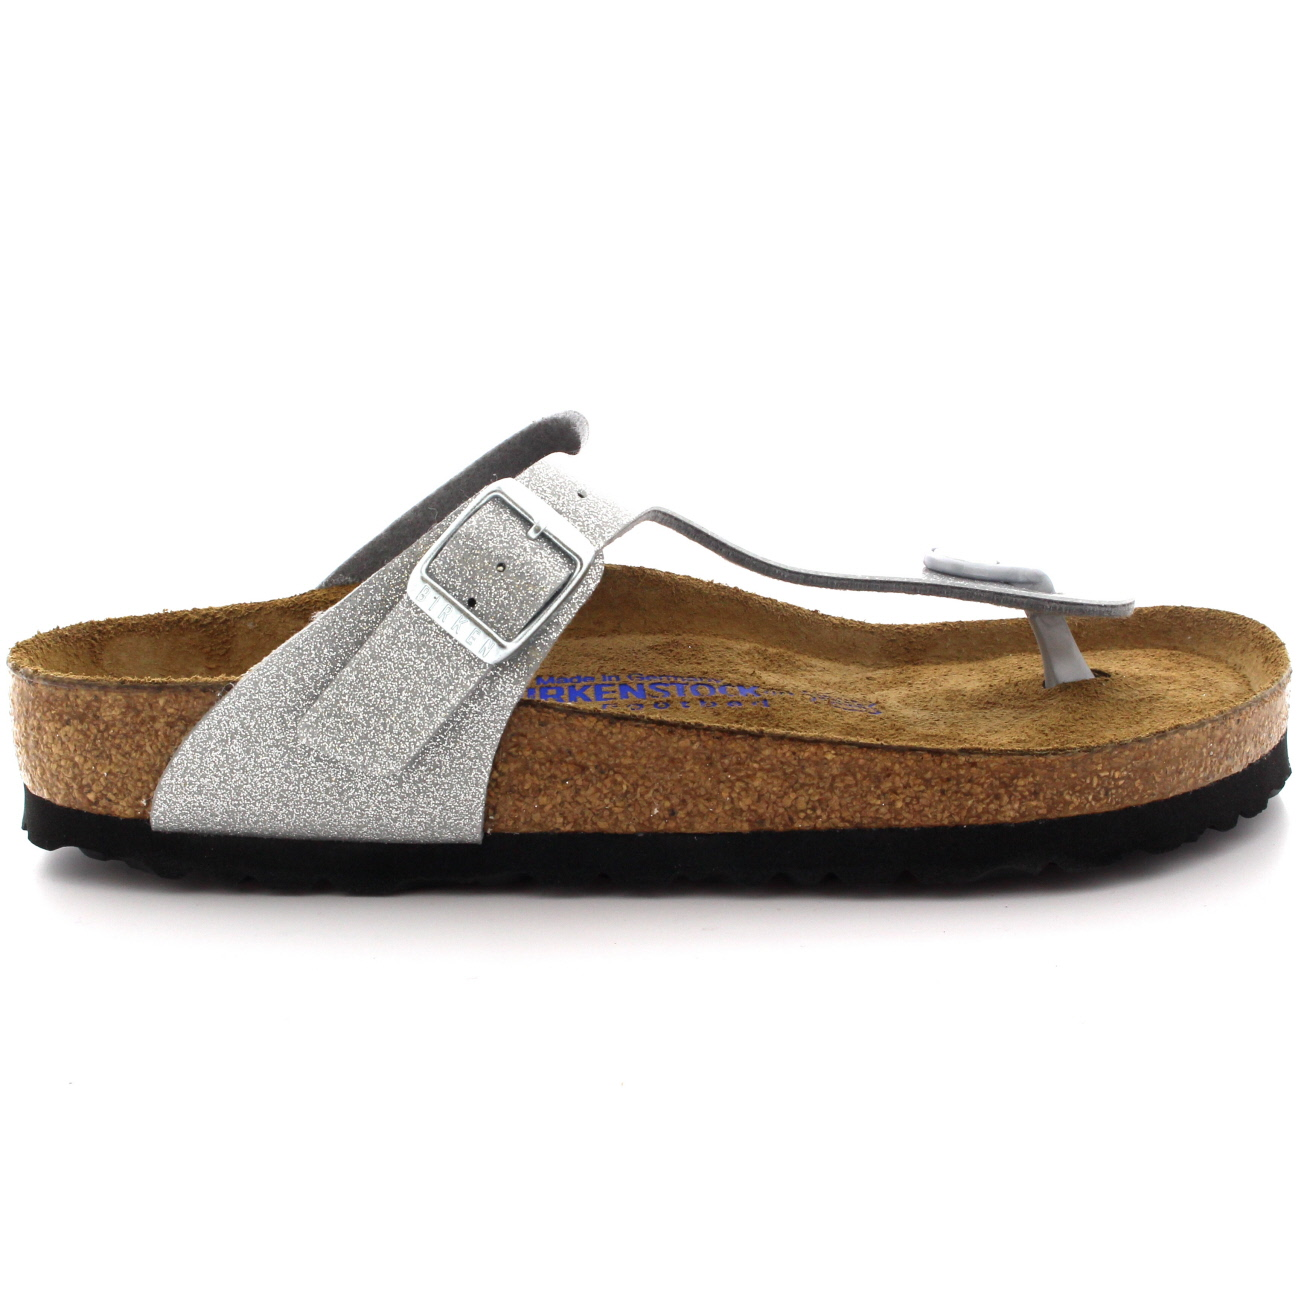 bwPSU1X5iS GIZEH - T-bar sandals - magic black wieg7E2iR